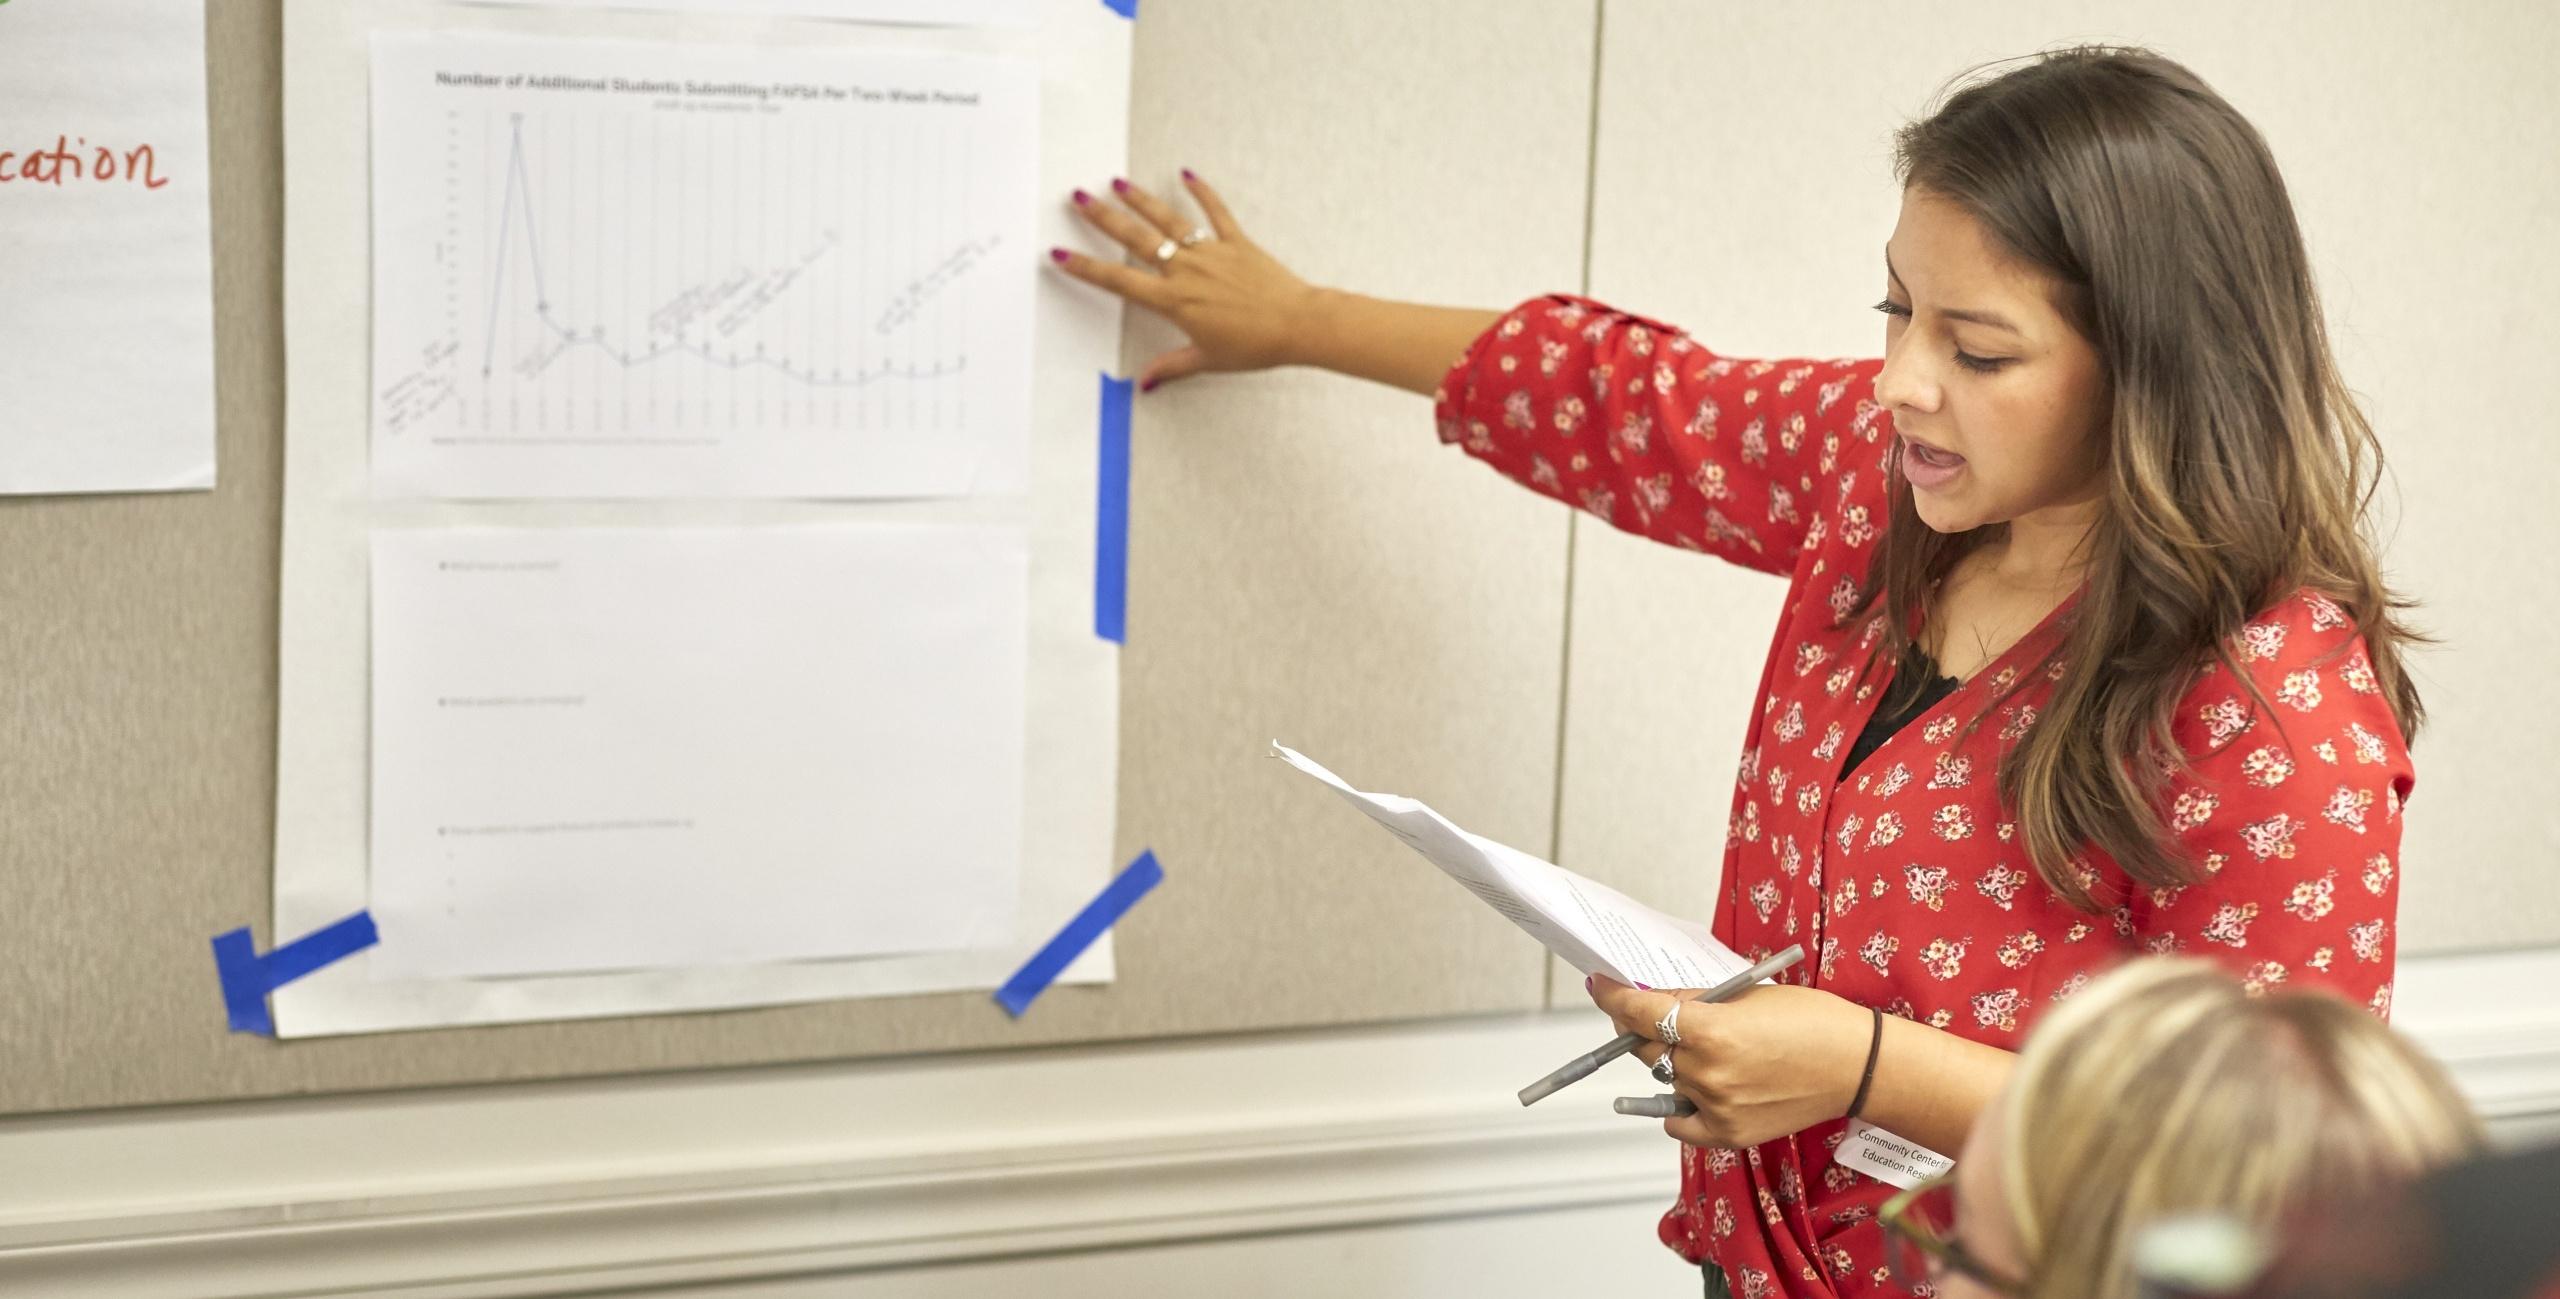 Educators examine data during a College and Career Leadership Institute workshop.